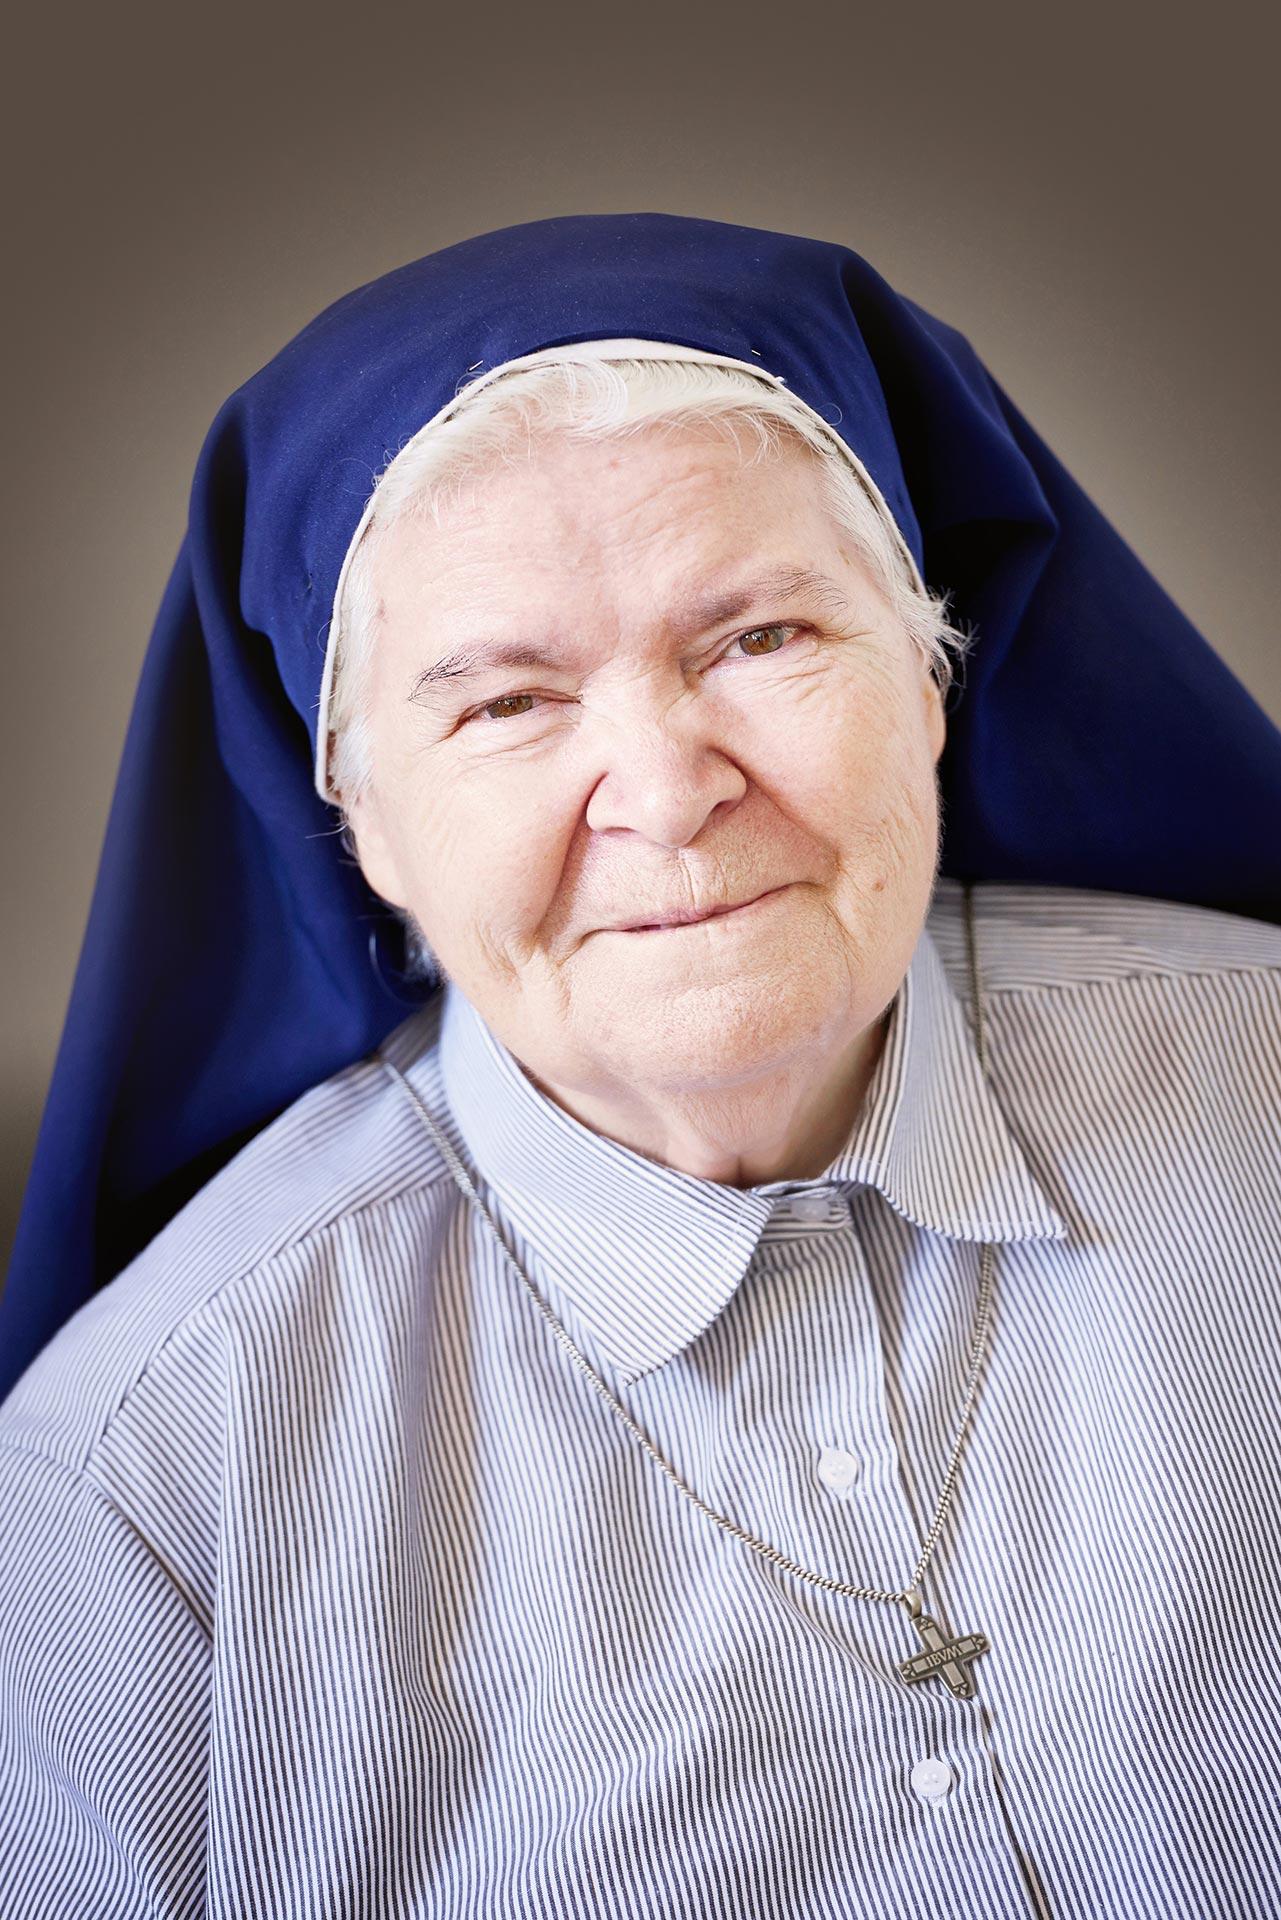 Sestra Cyril